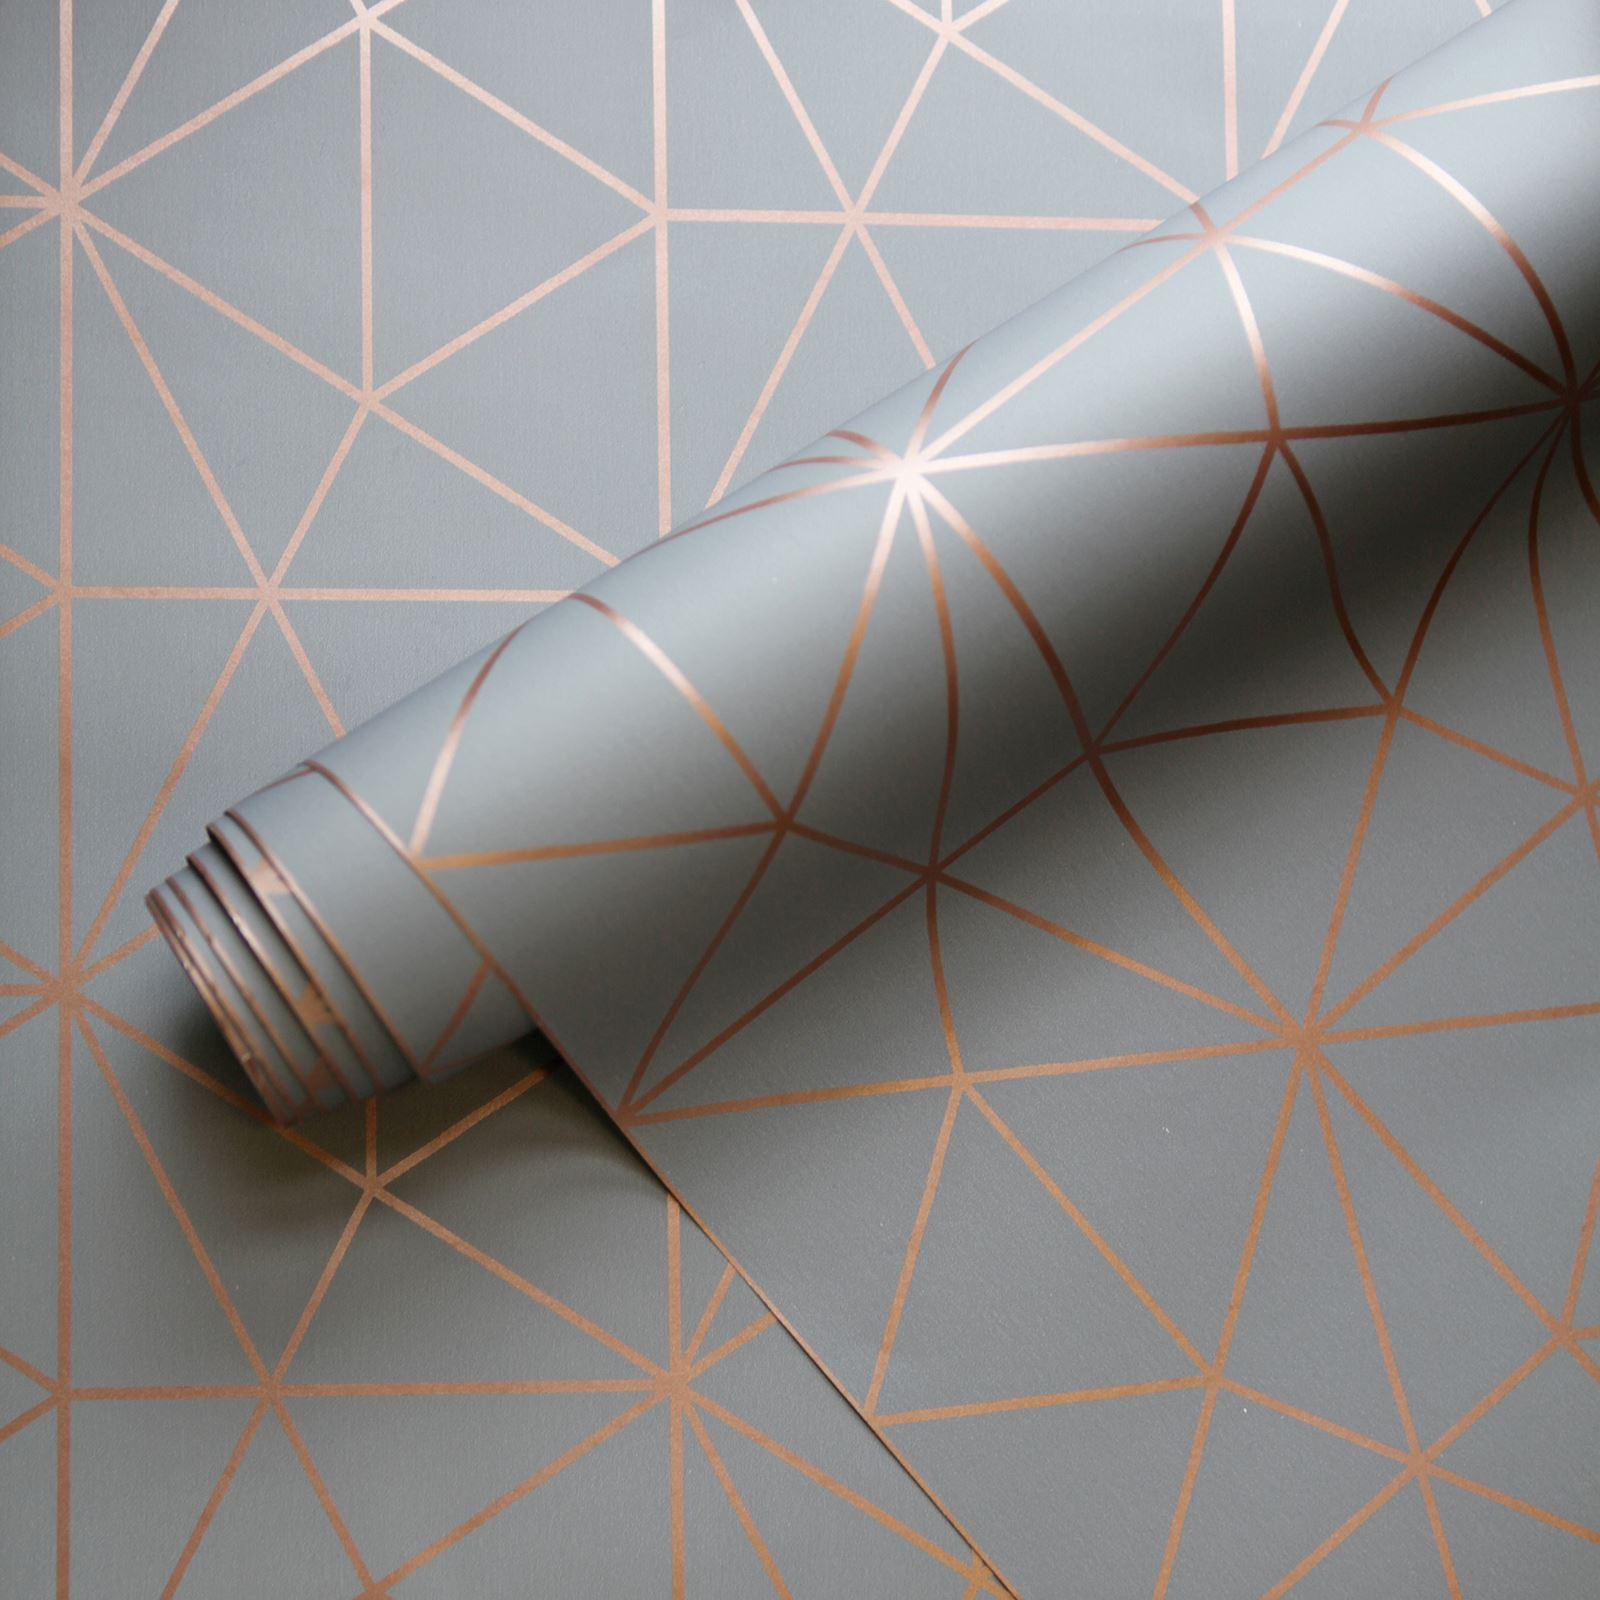 miniatura 129 - Carta da Parati Geometrica Arredamento Camera Moderno Vari Disegni e Colori